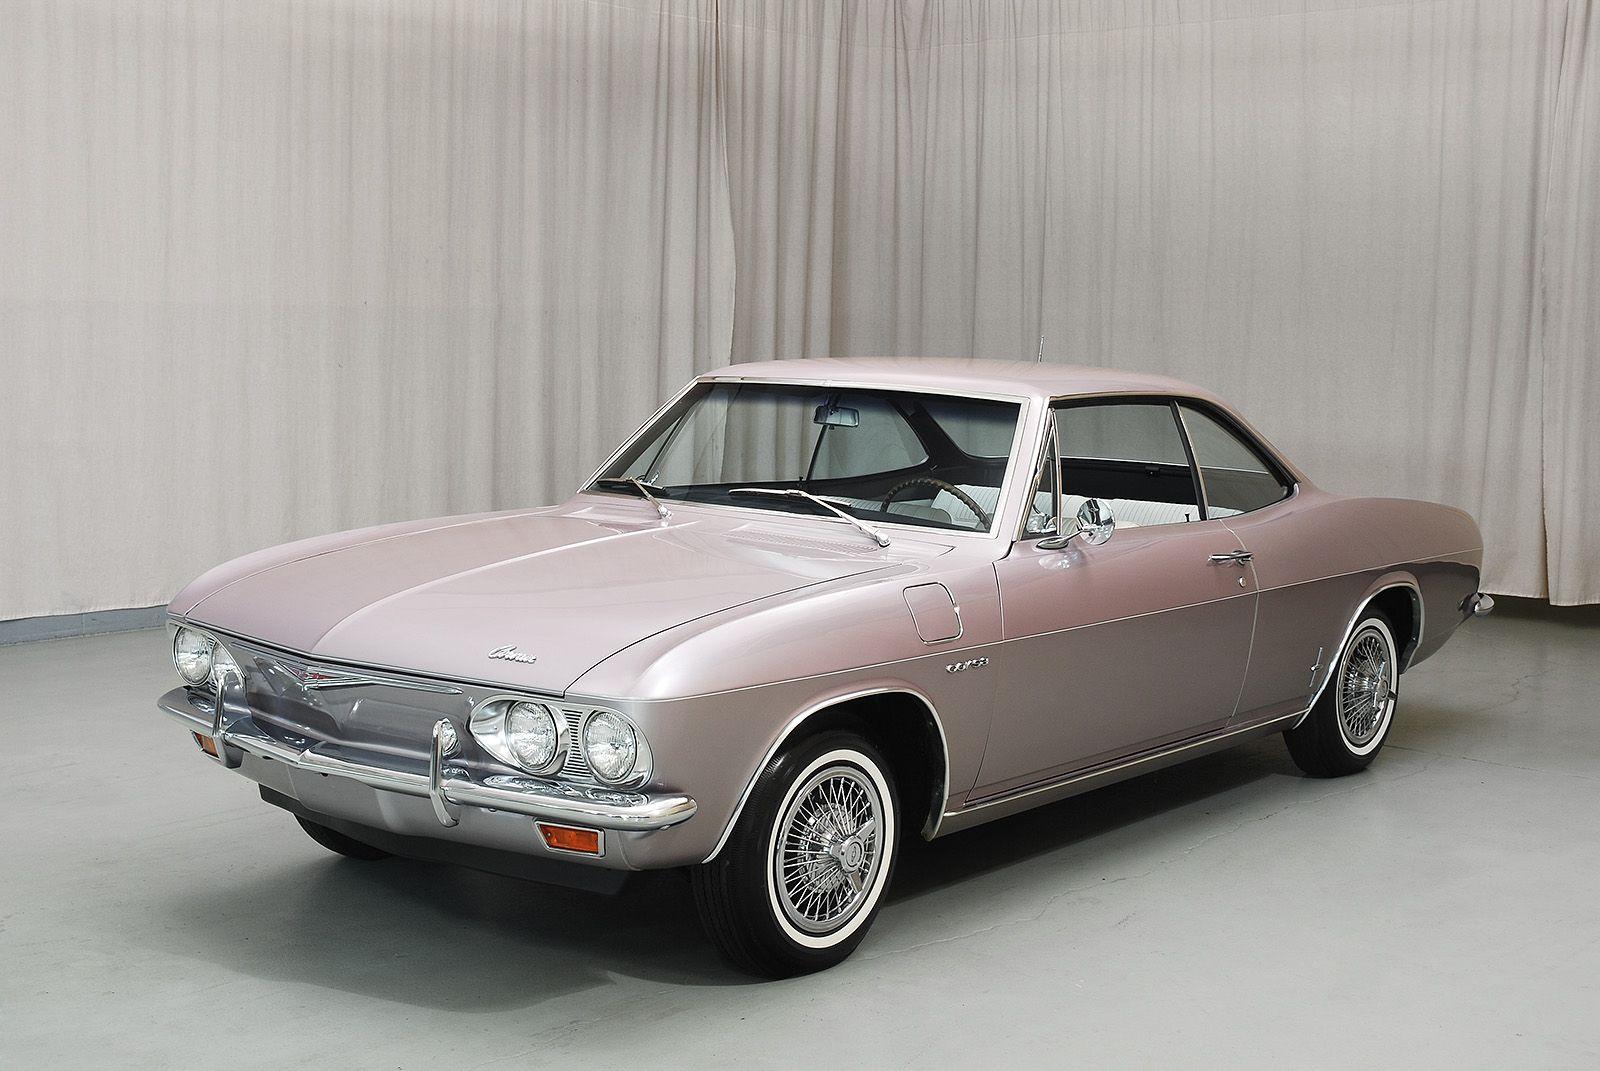 1965 Chevrolet Corvair Corsa Coupe - Hyman Ltd. Classic Cars ...